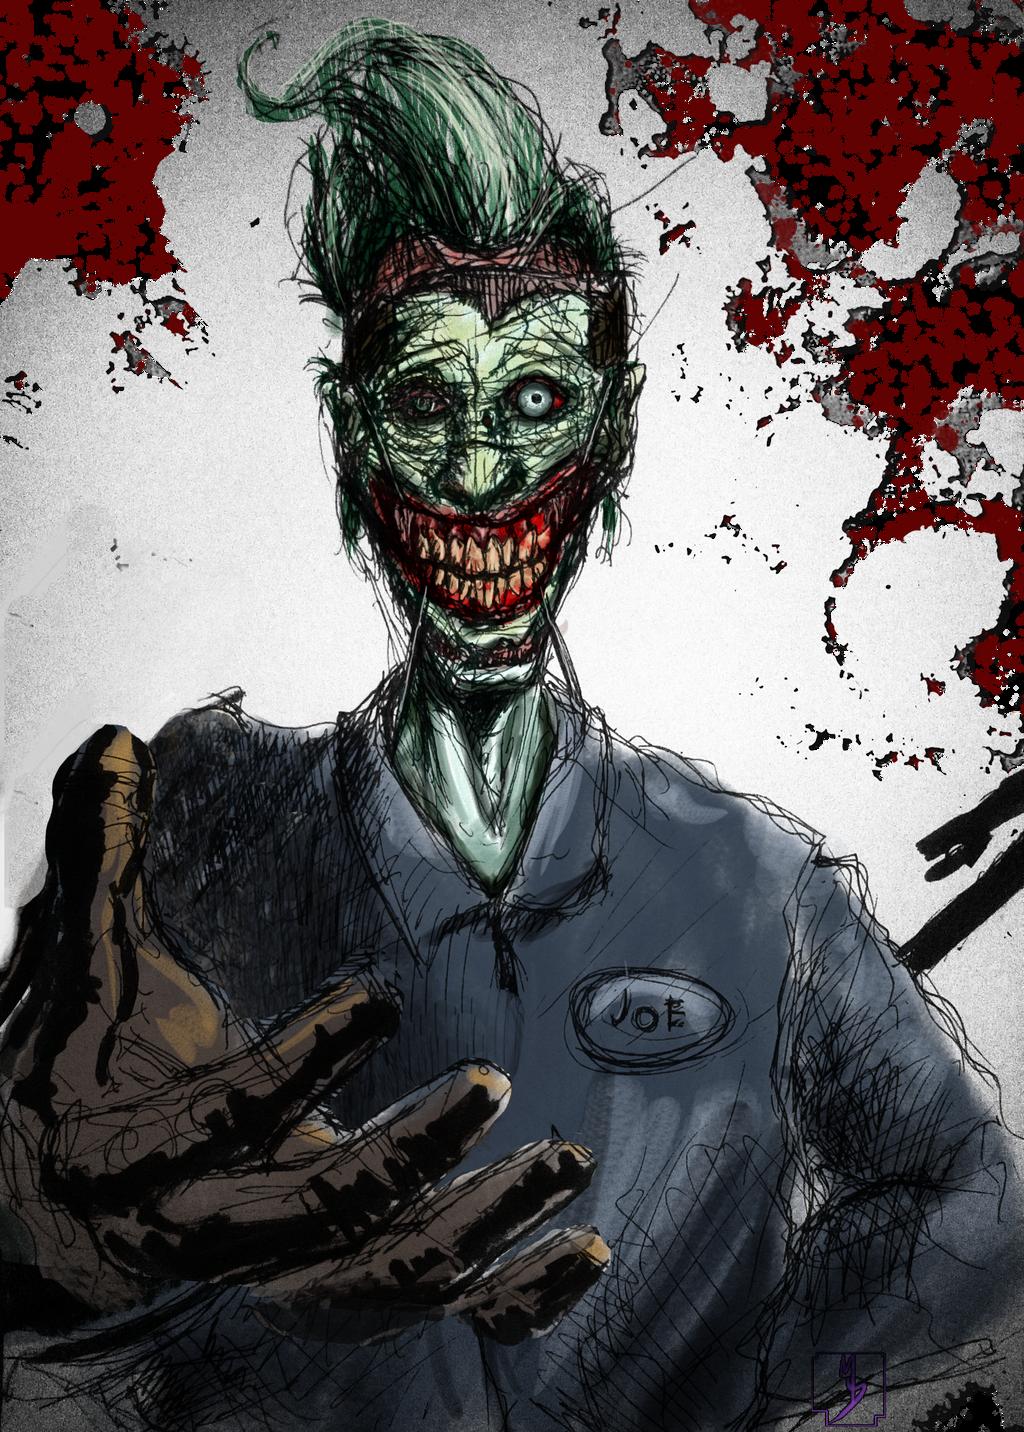 The Joker 52 By Snoopymd On Deviantart